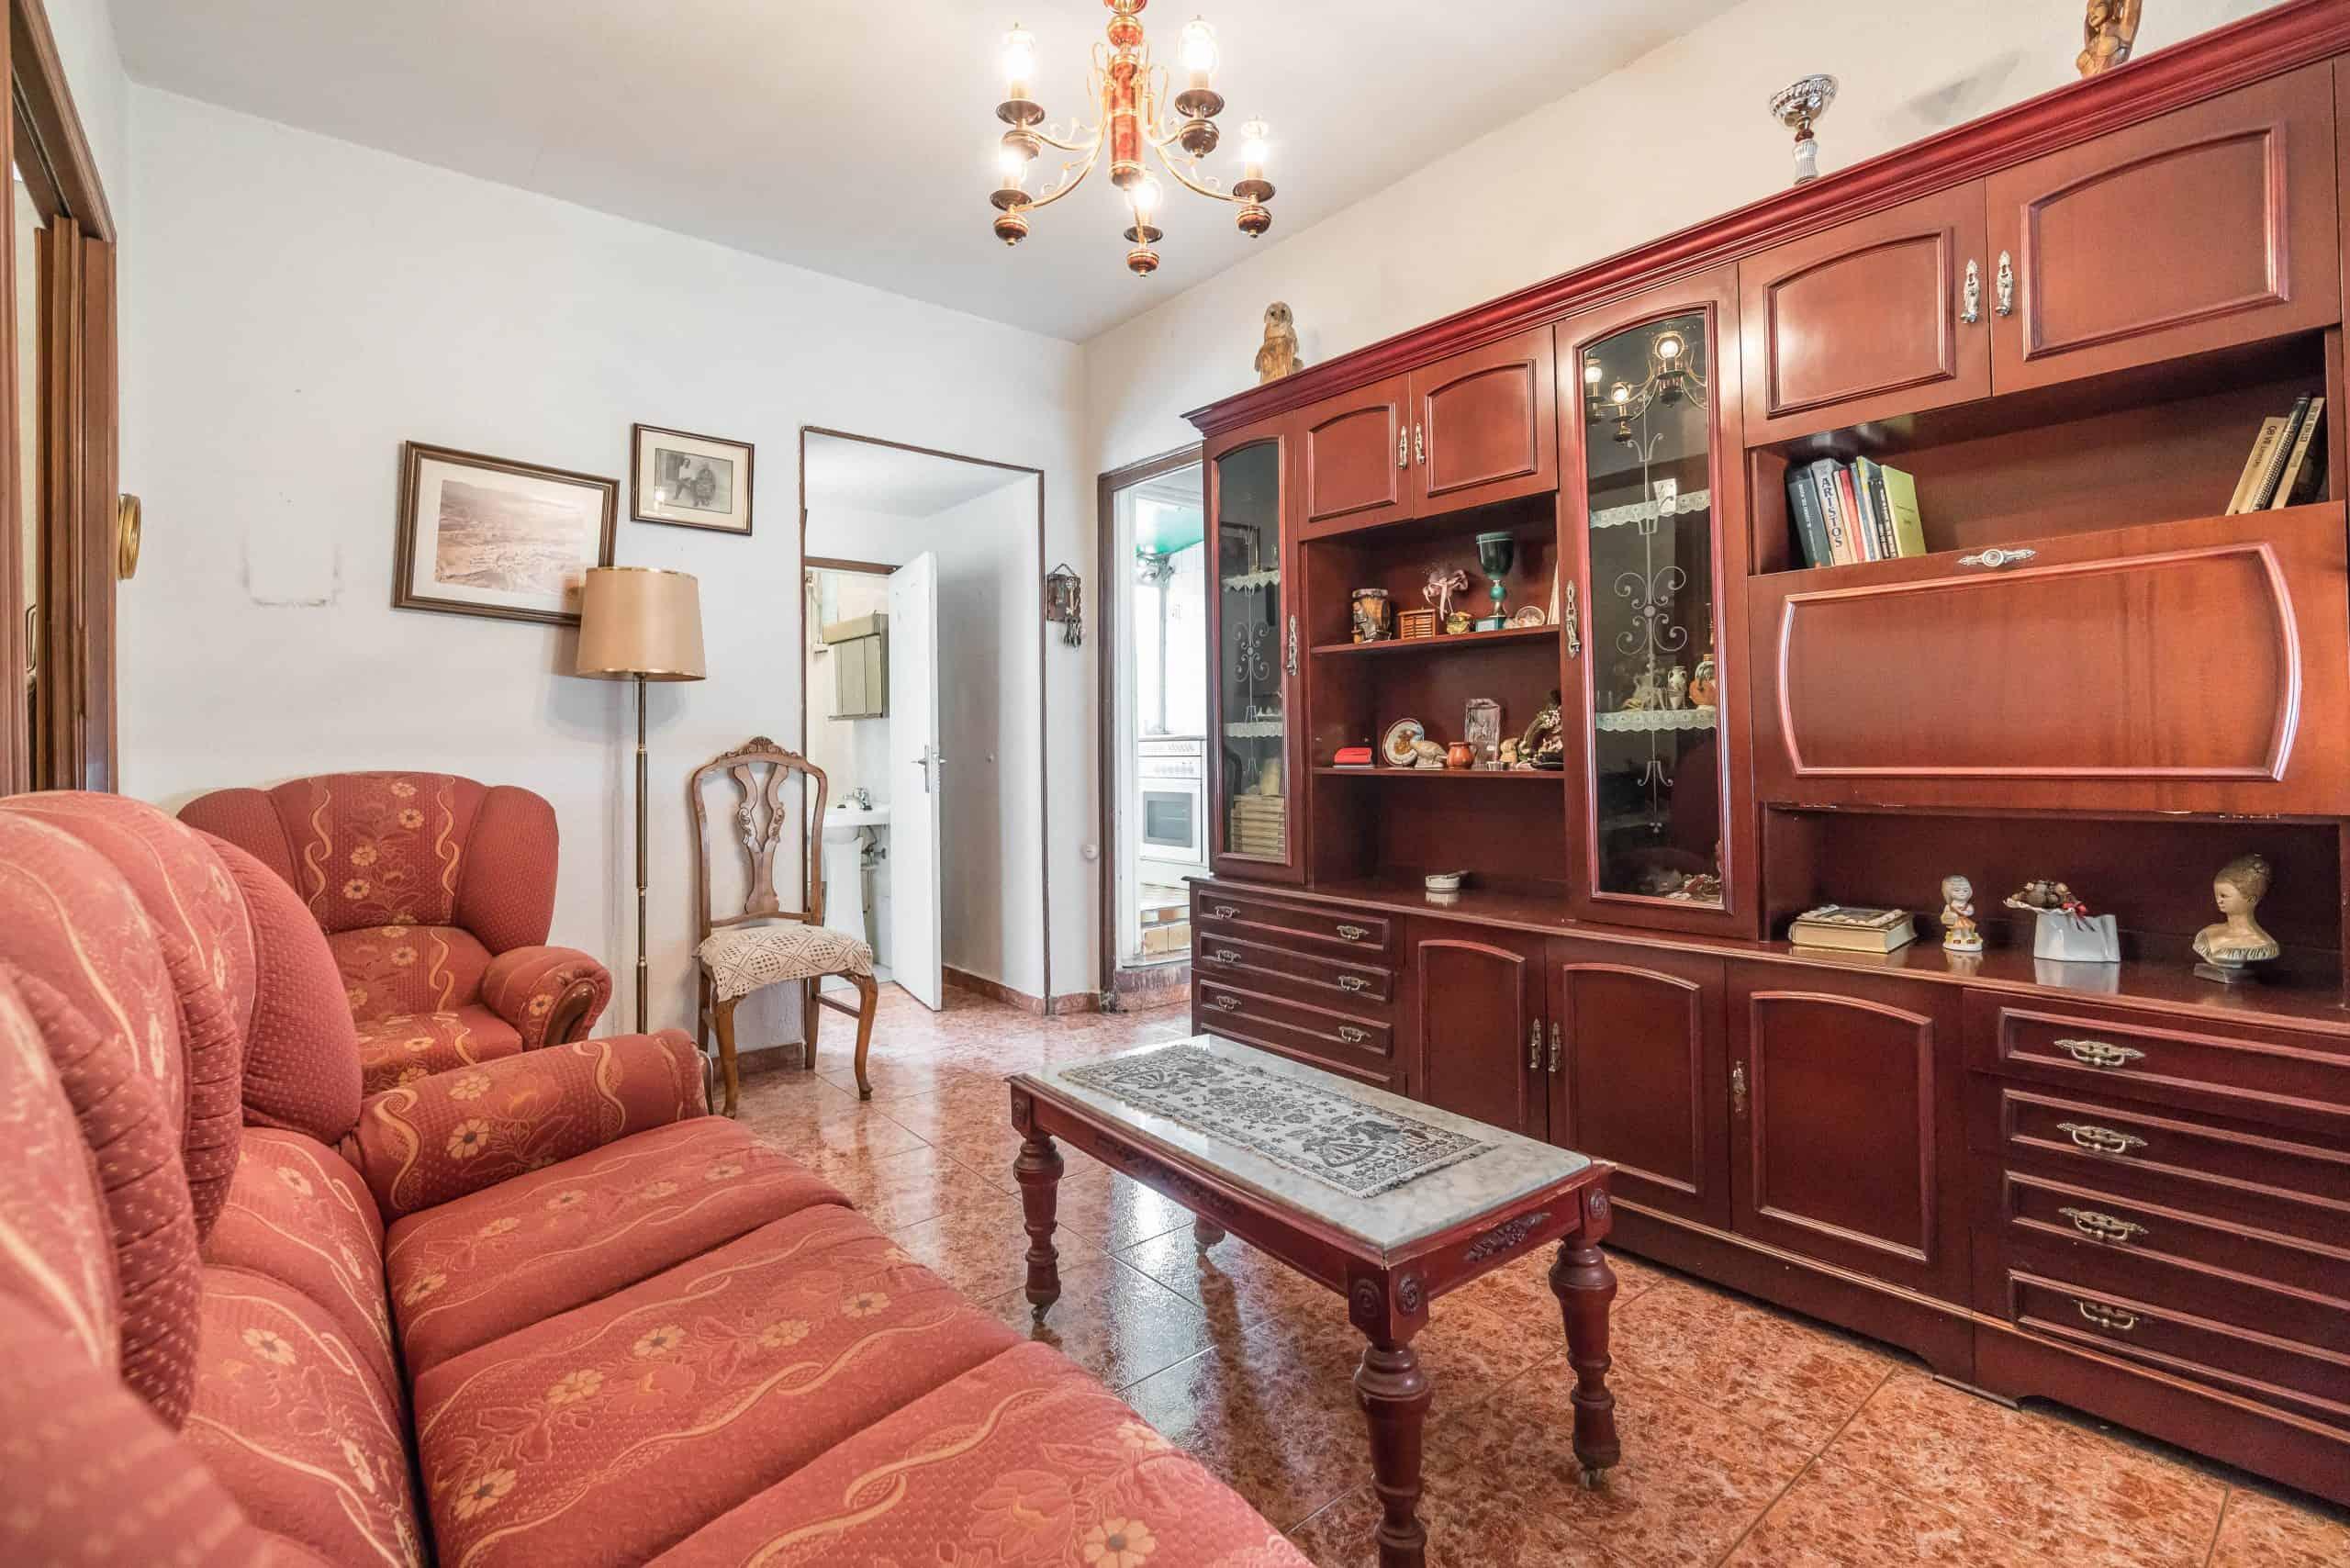 Agencia Inmobiliaria de Madrid-FUTUROCASA-Zona ARGANZUELA-EMBAJADORES-LEGAZPI -calle DOMINGO PEREZ DEL VAL -1 SALON (3)